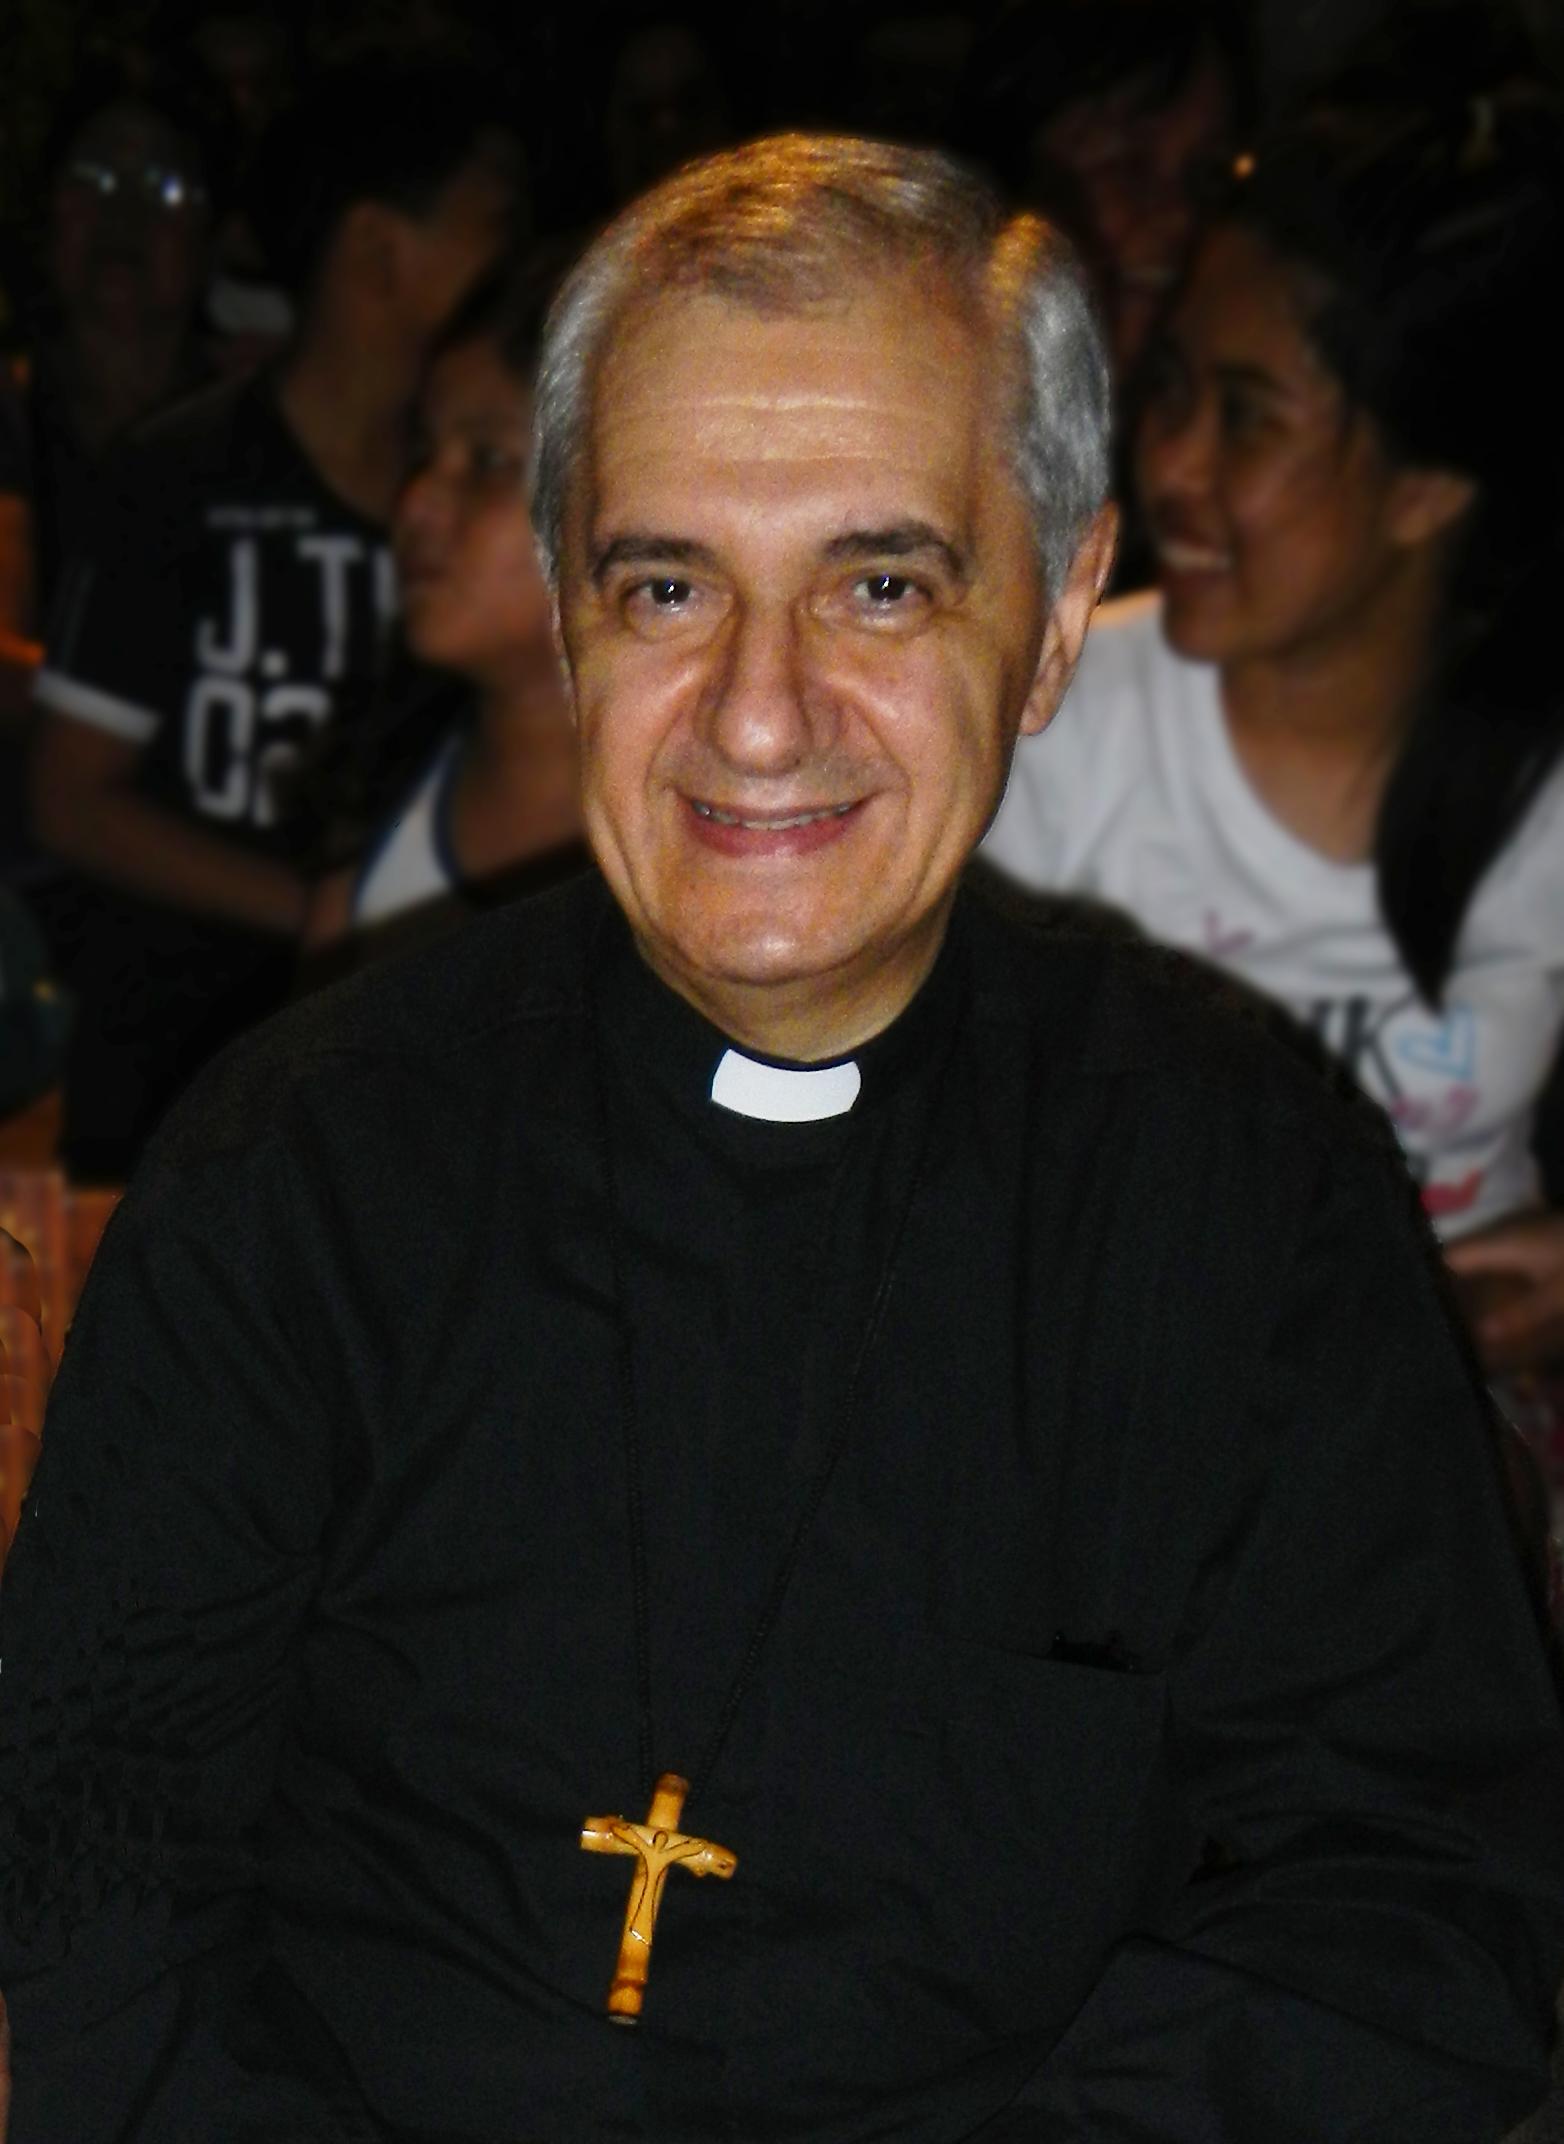 GiuseppePintoajf2211.JPG